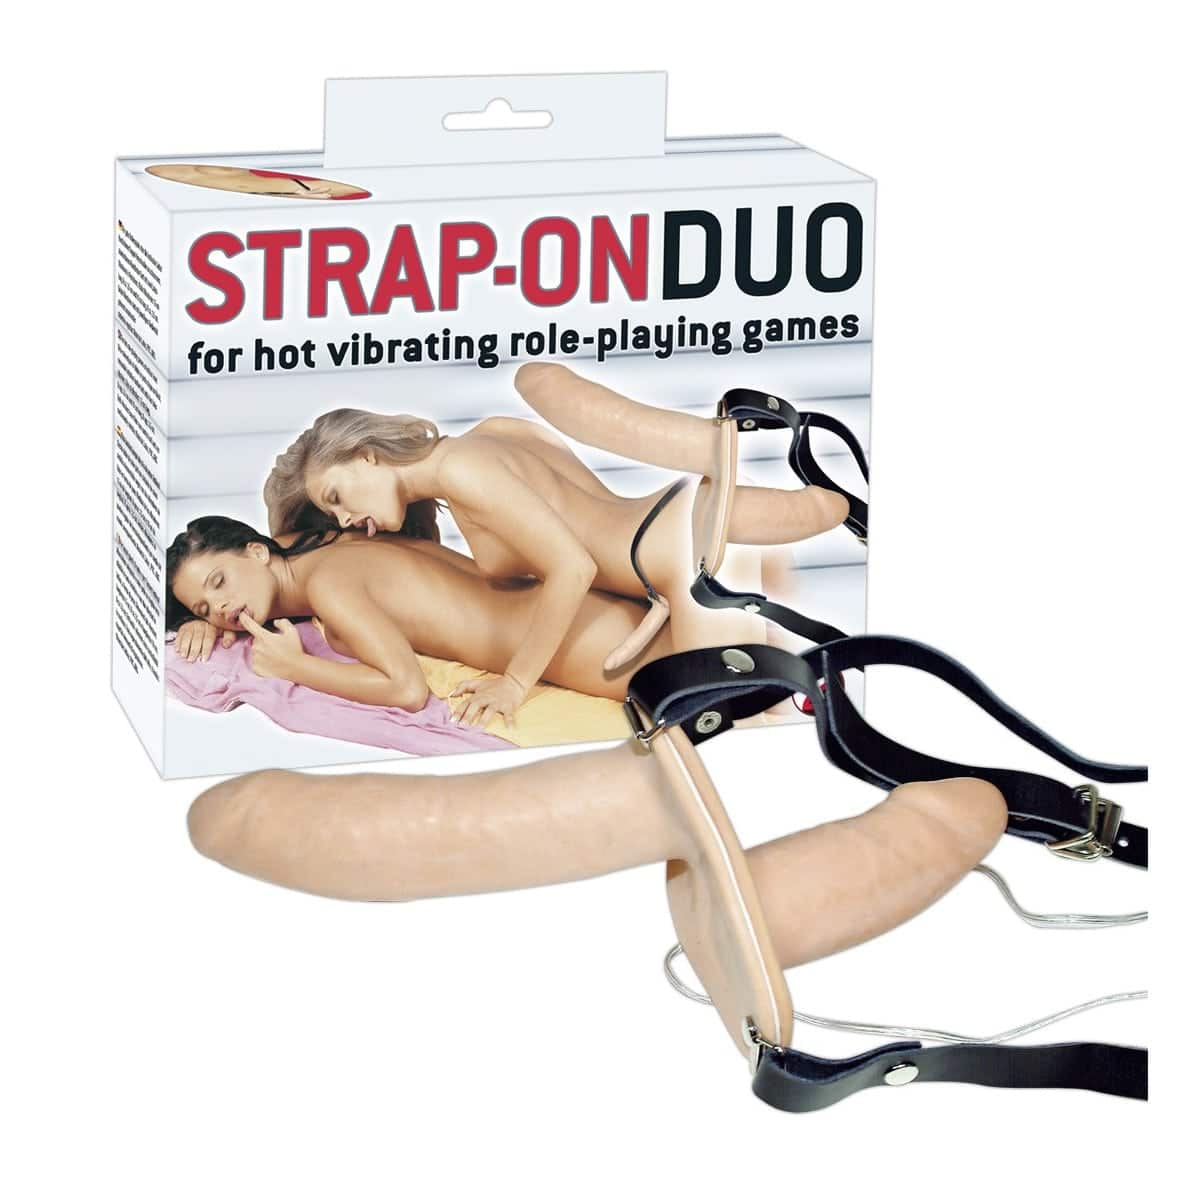 Vibrating Flesh Strap On Duo Vibrating Dongs